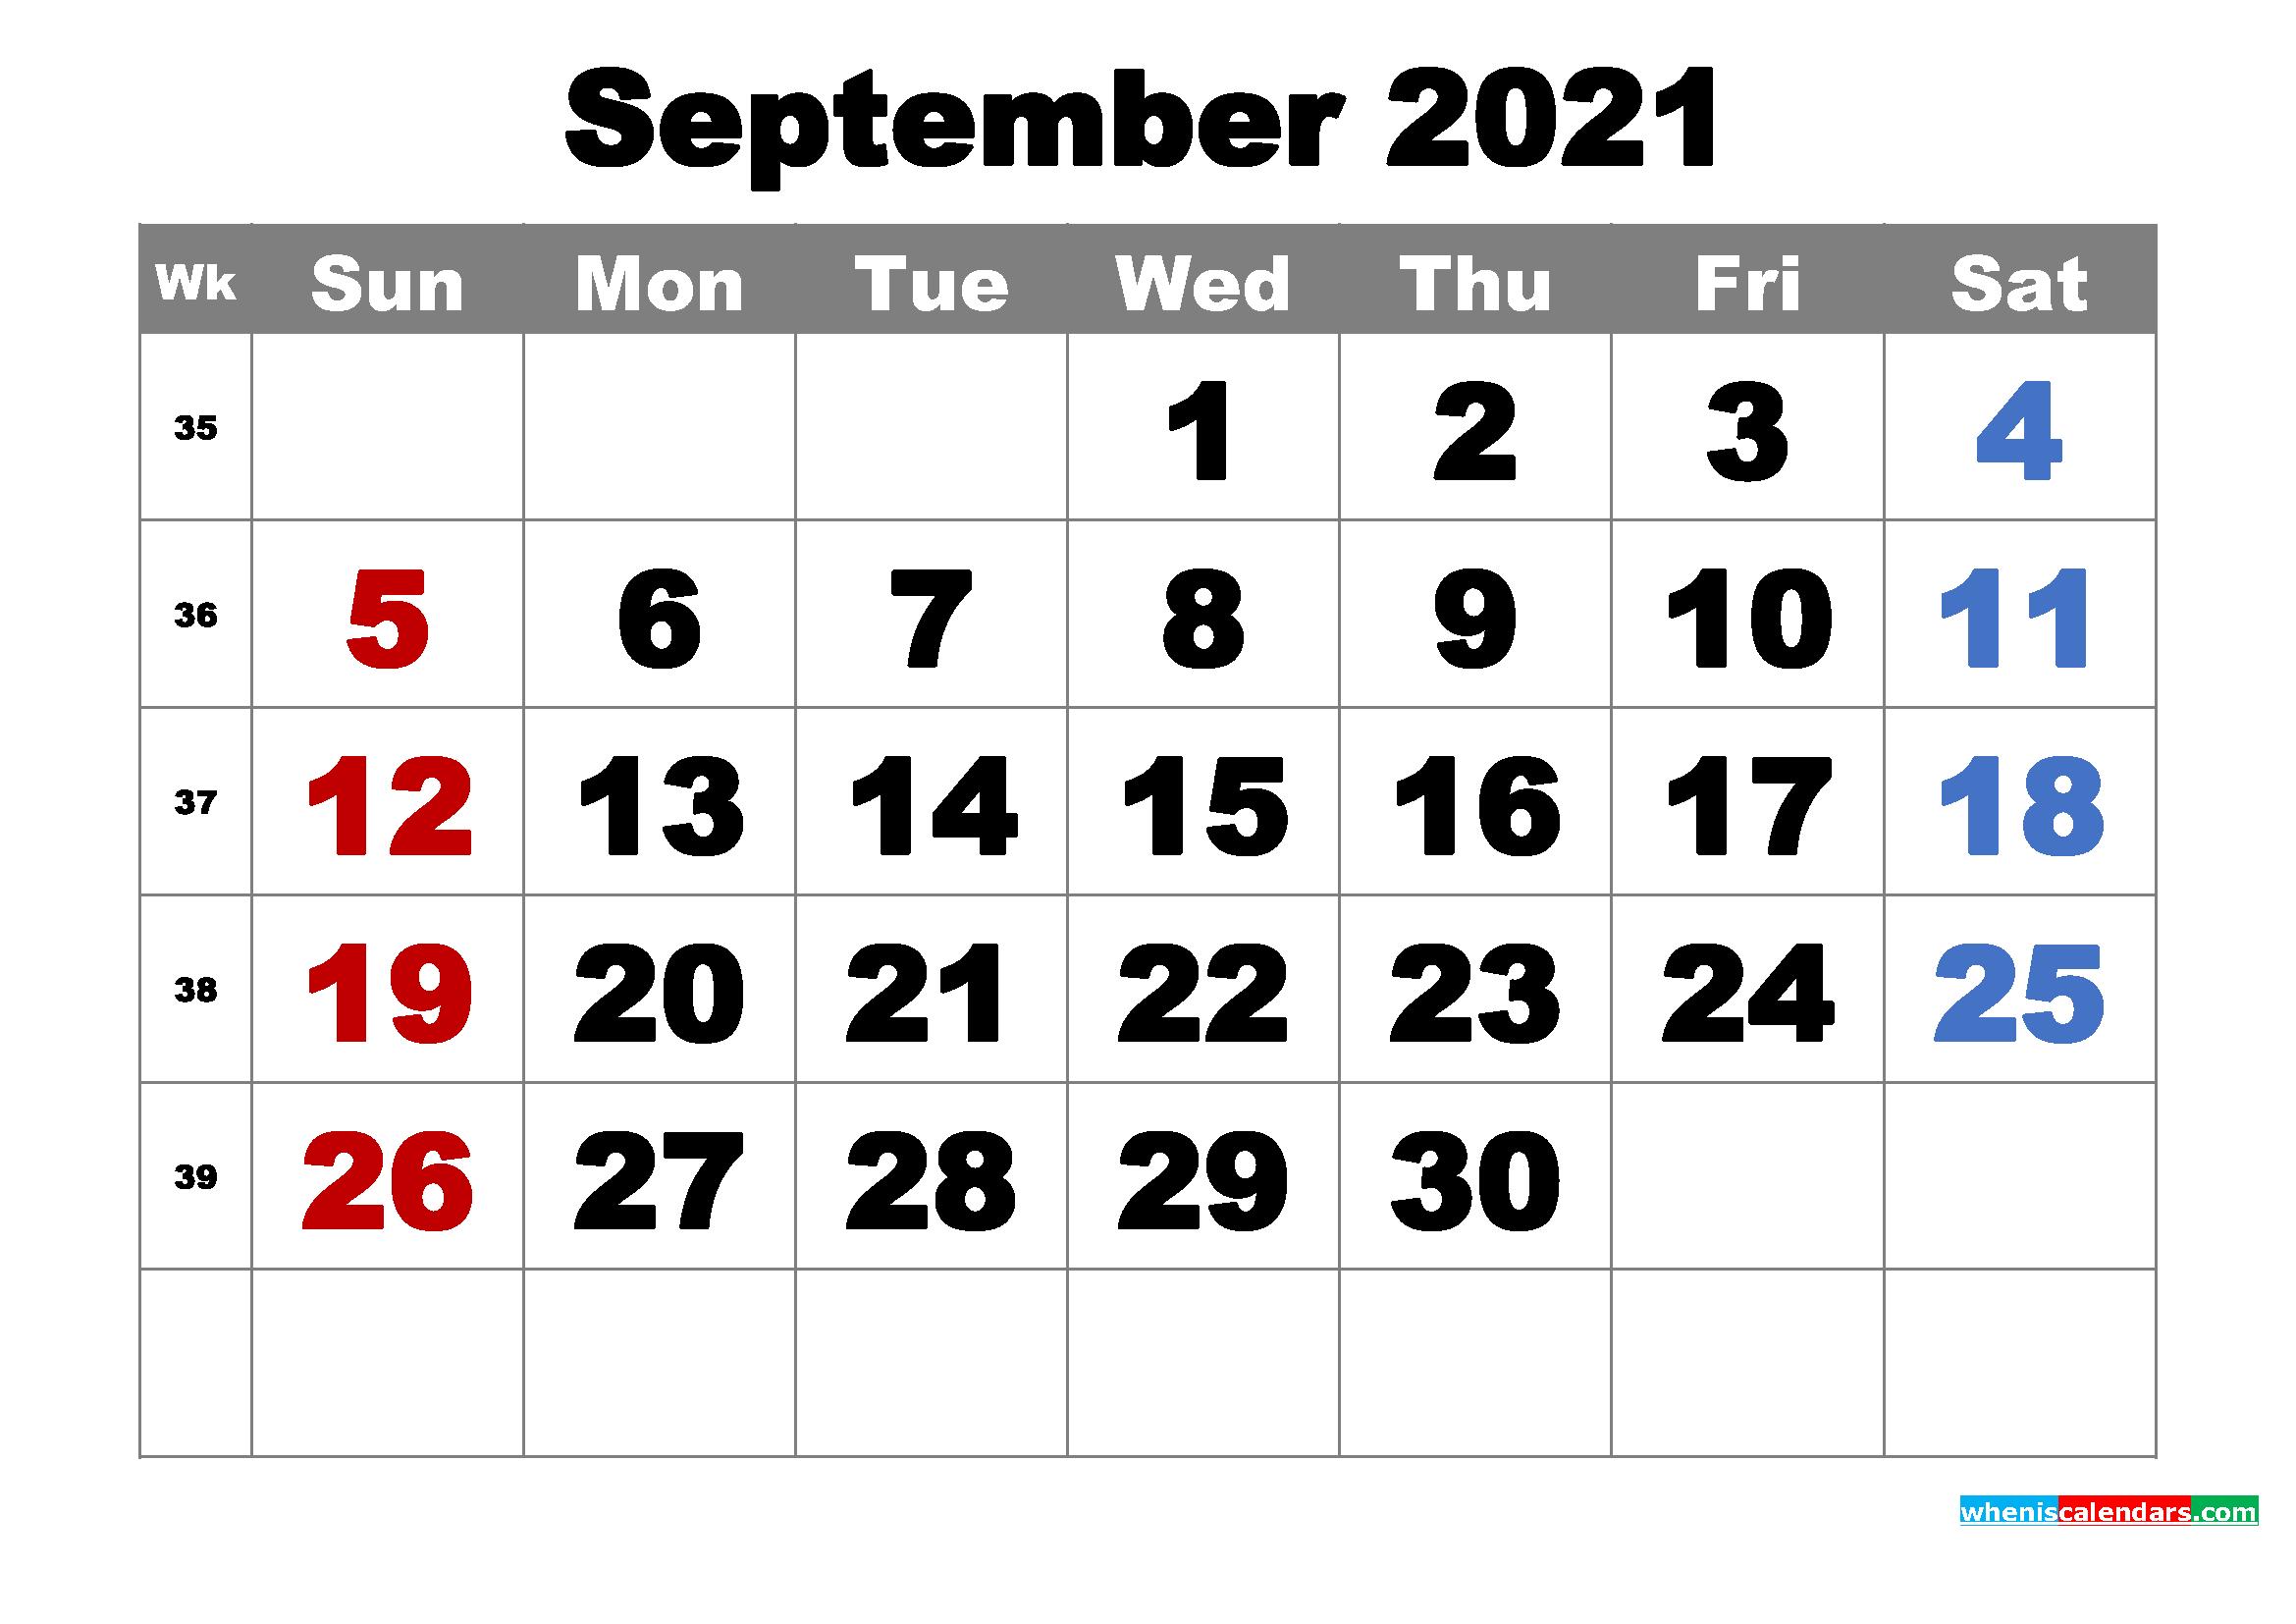 Free Printable September 2021 Calendar Word, PDF, Image ...